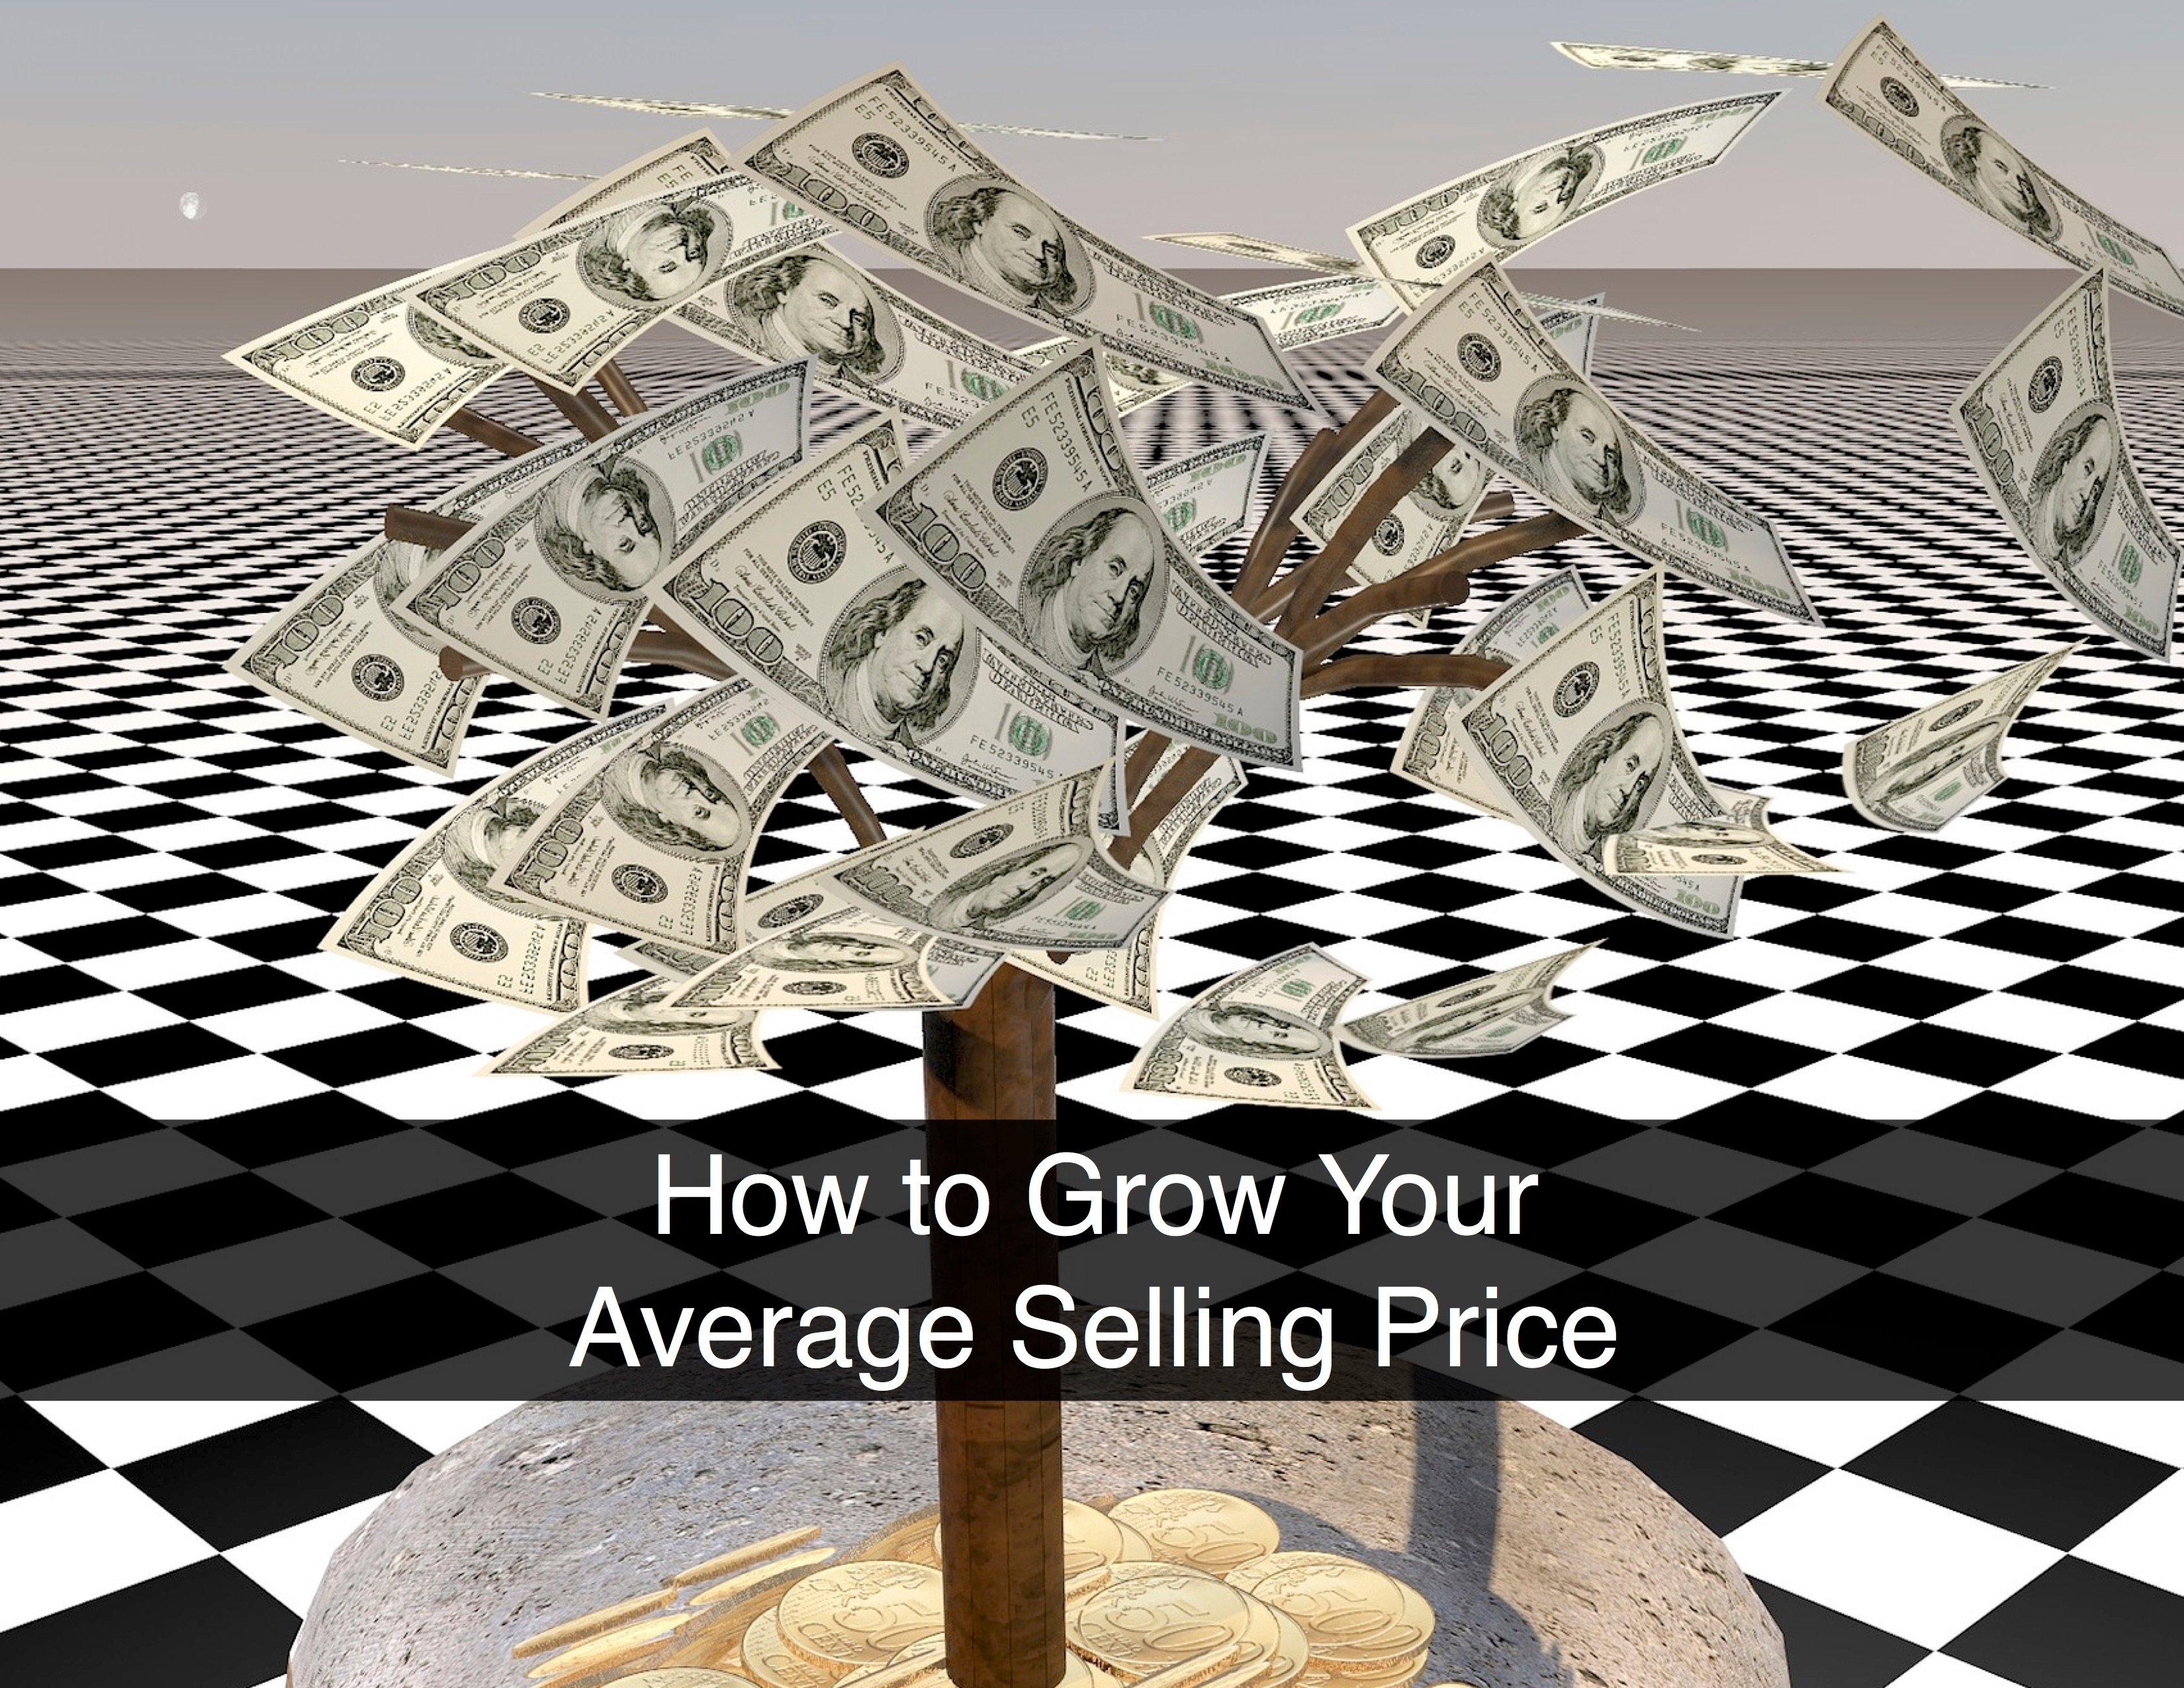 Grow_Average_Selling_Price